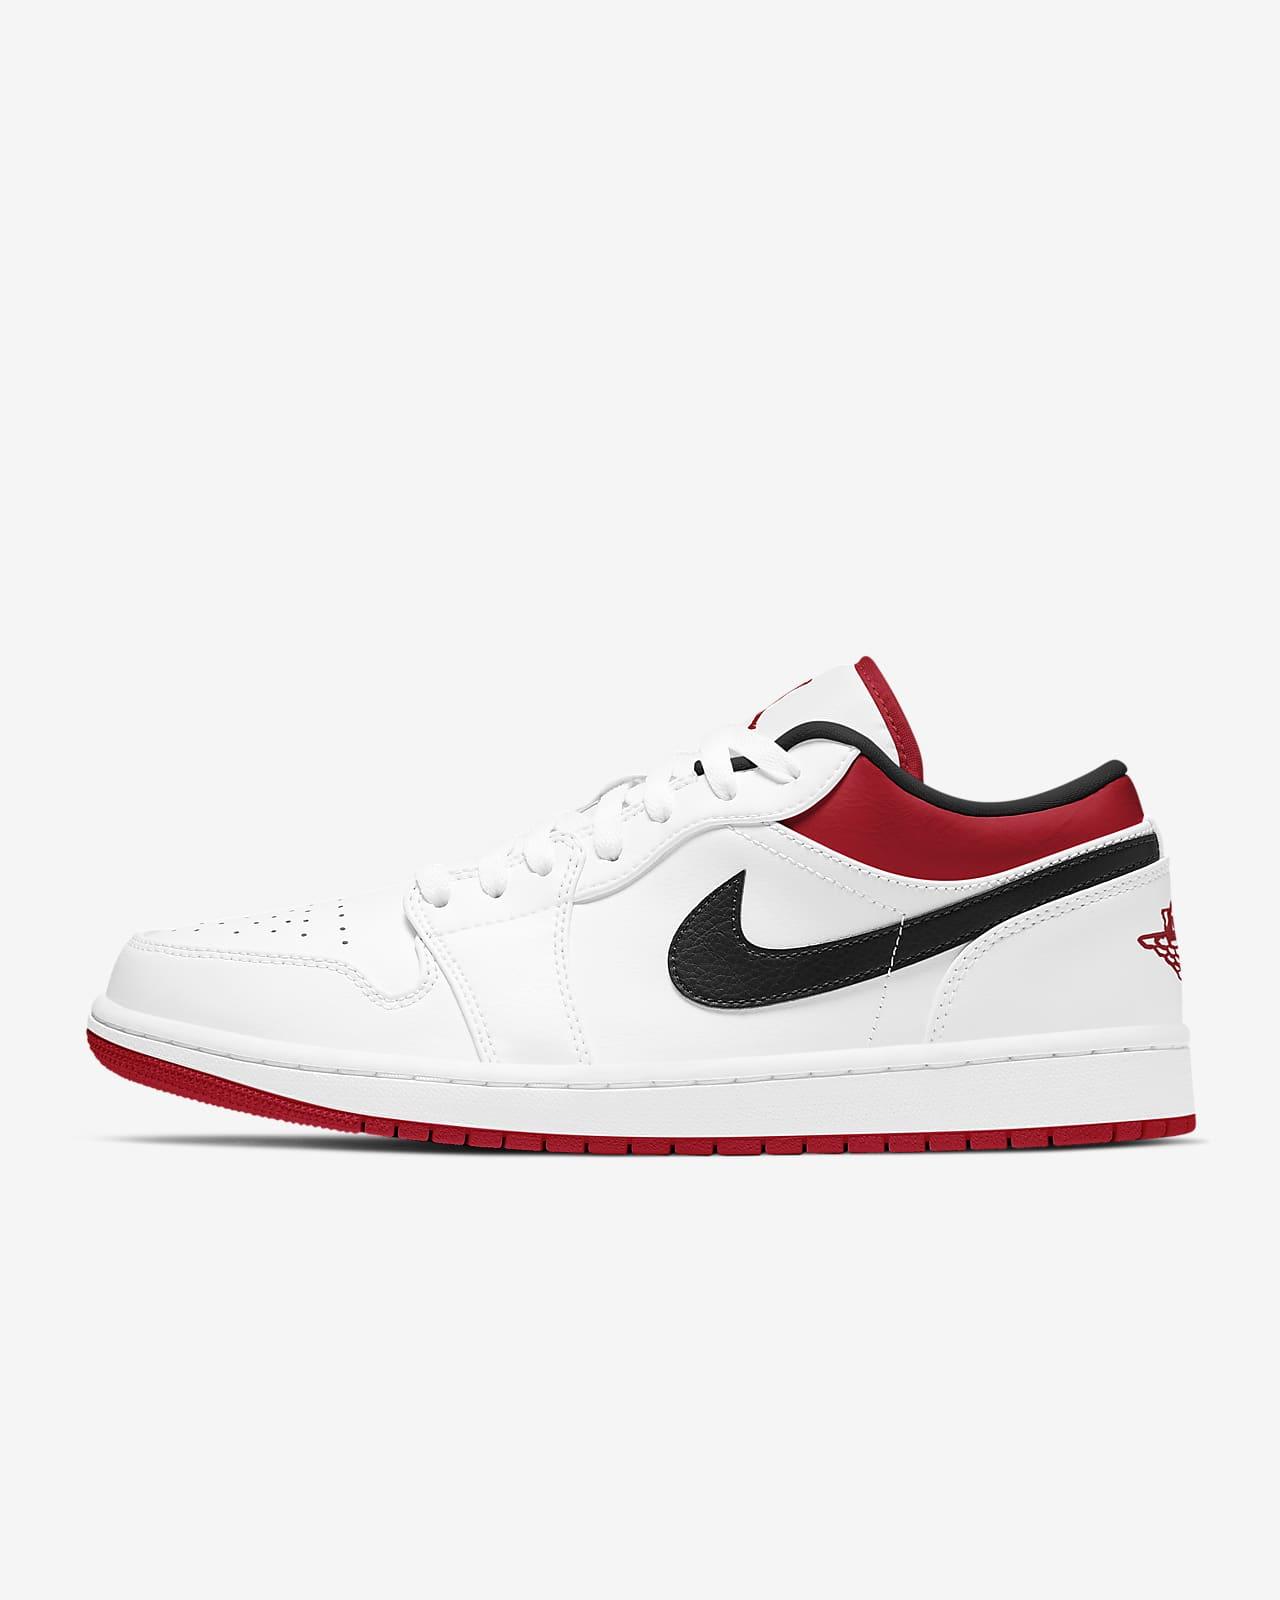 Calzado Air Jordan 1 Low